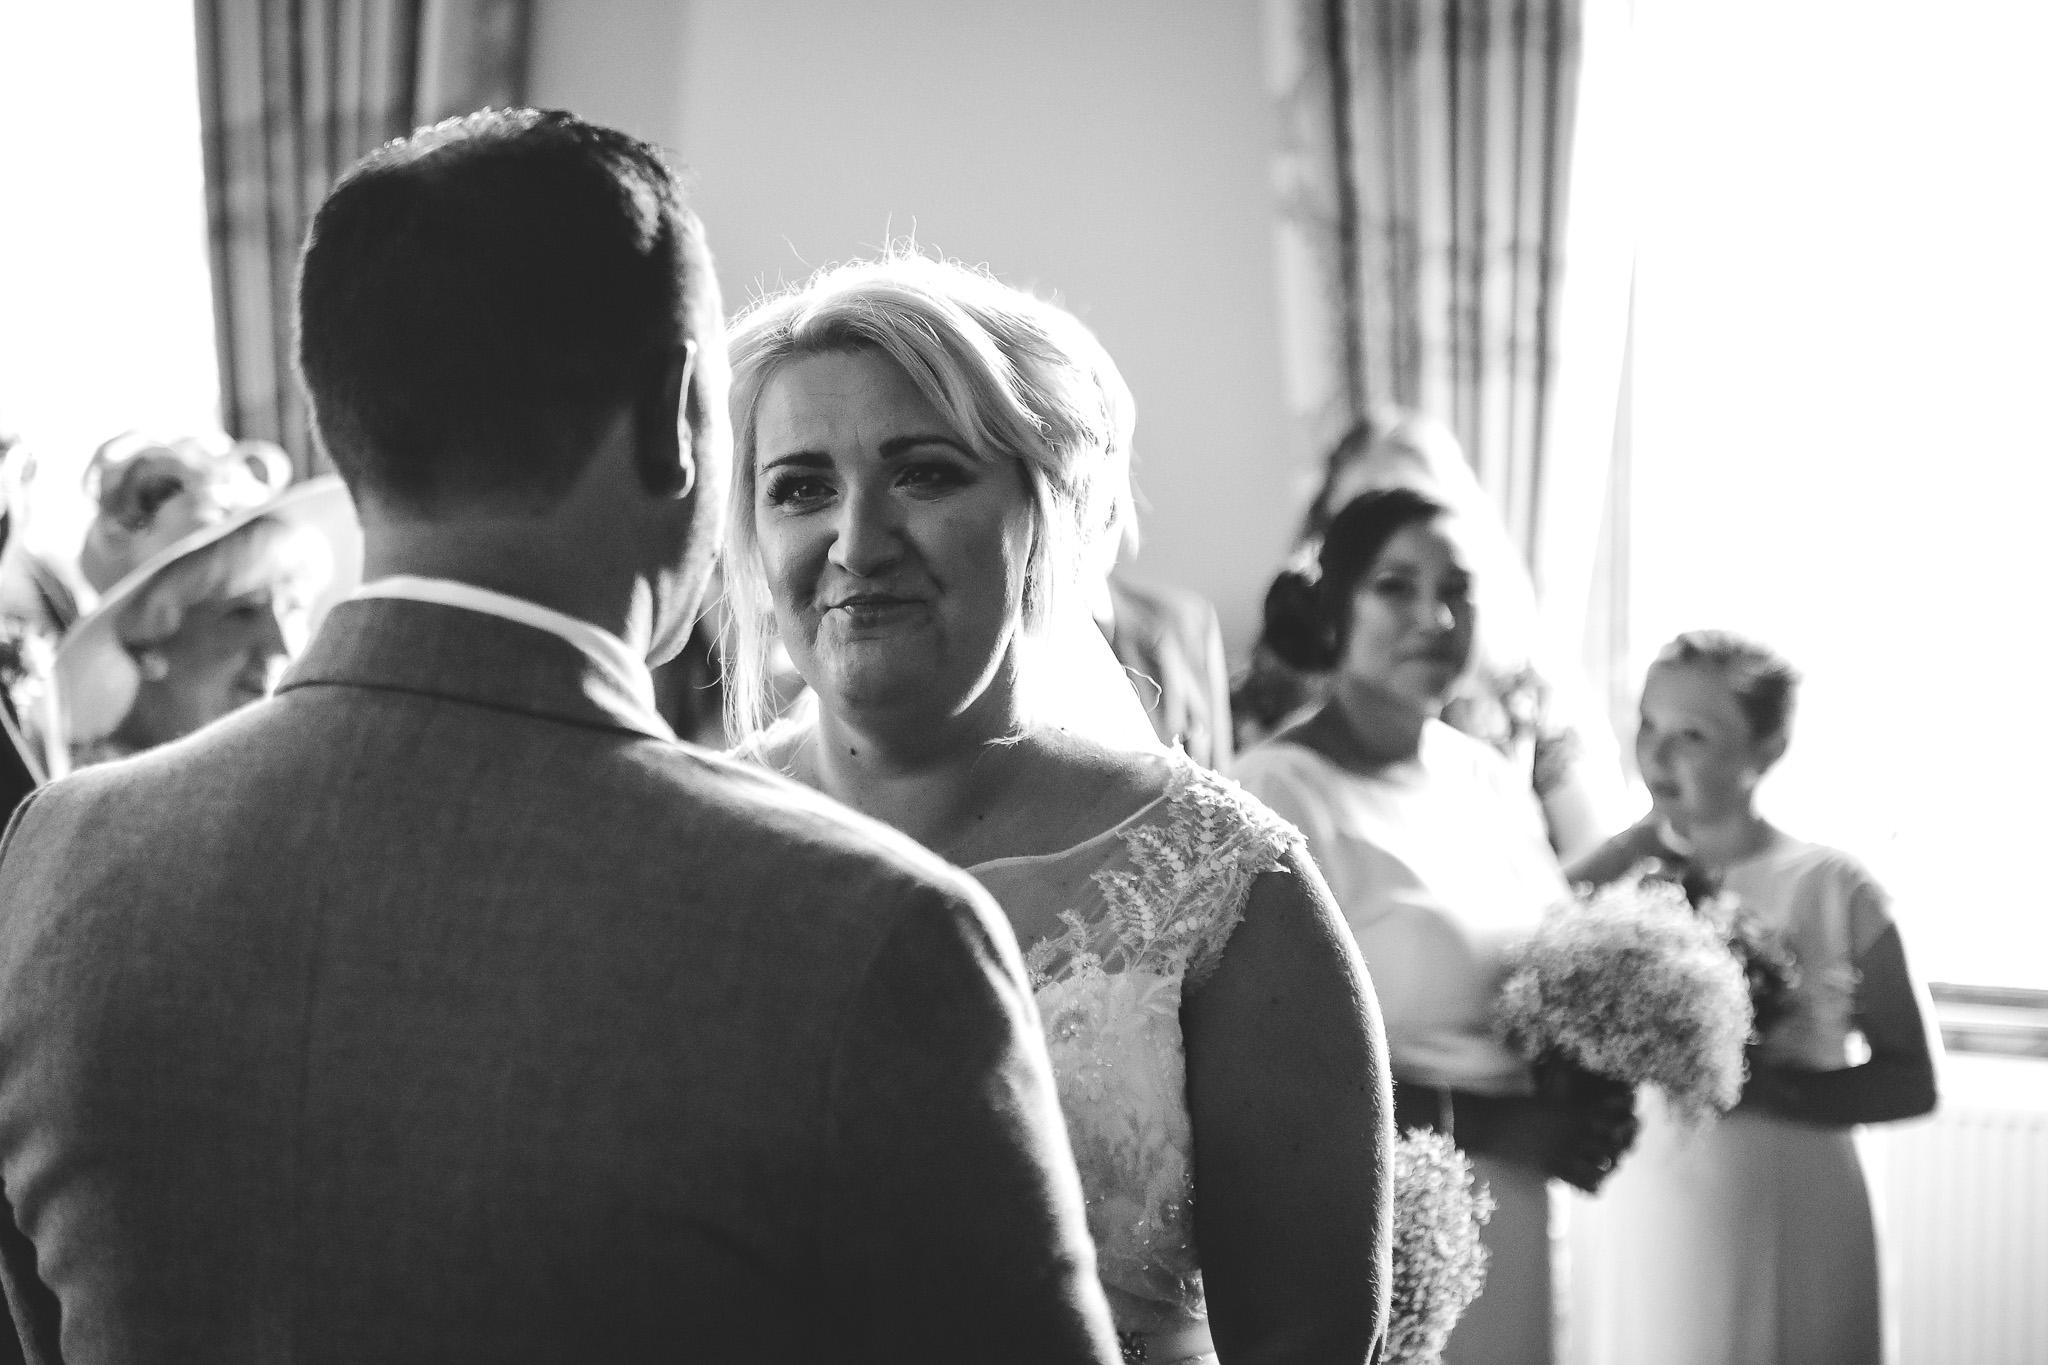 Happpy wedding guests